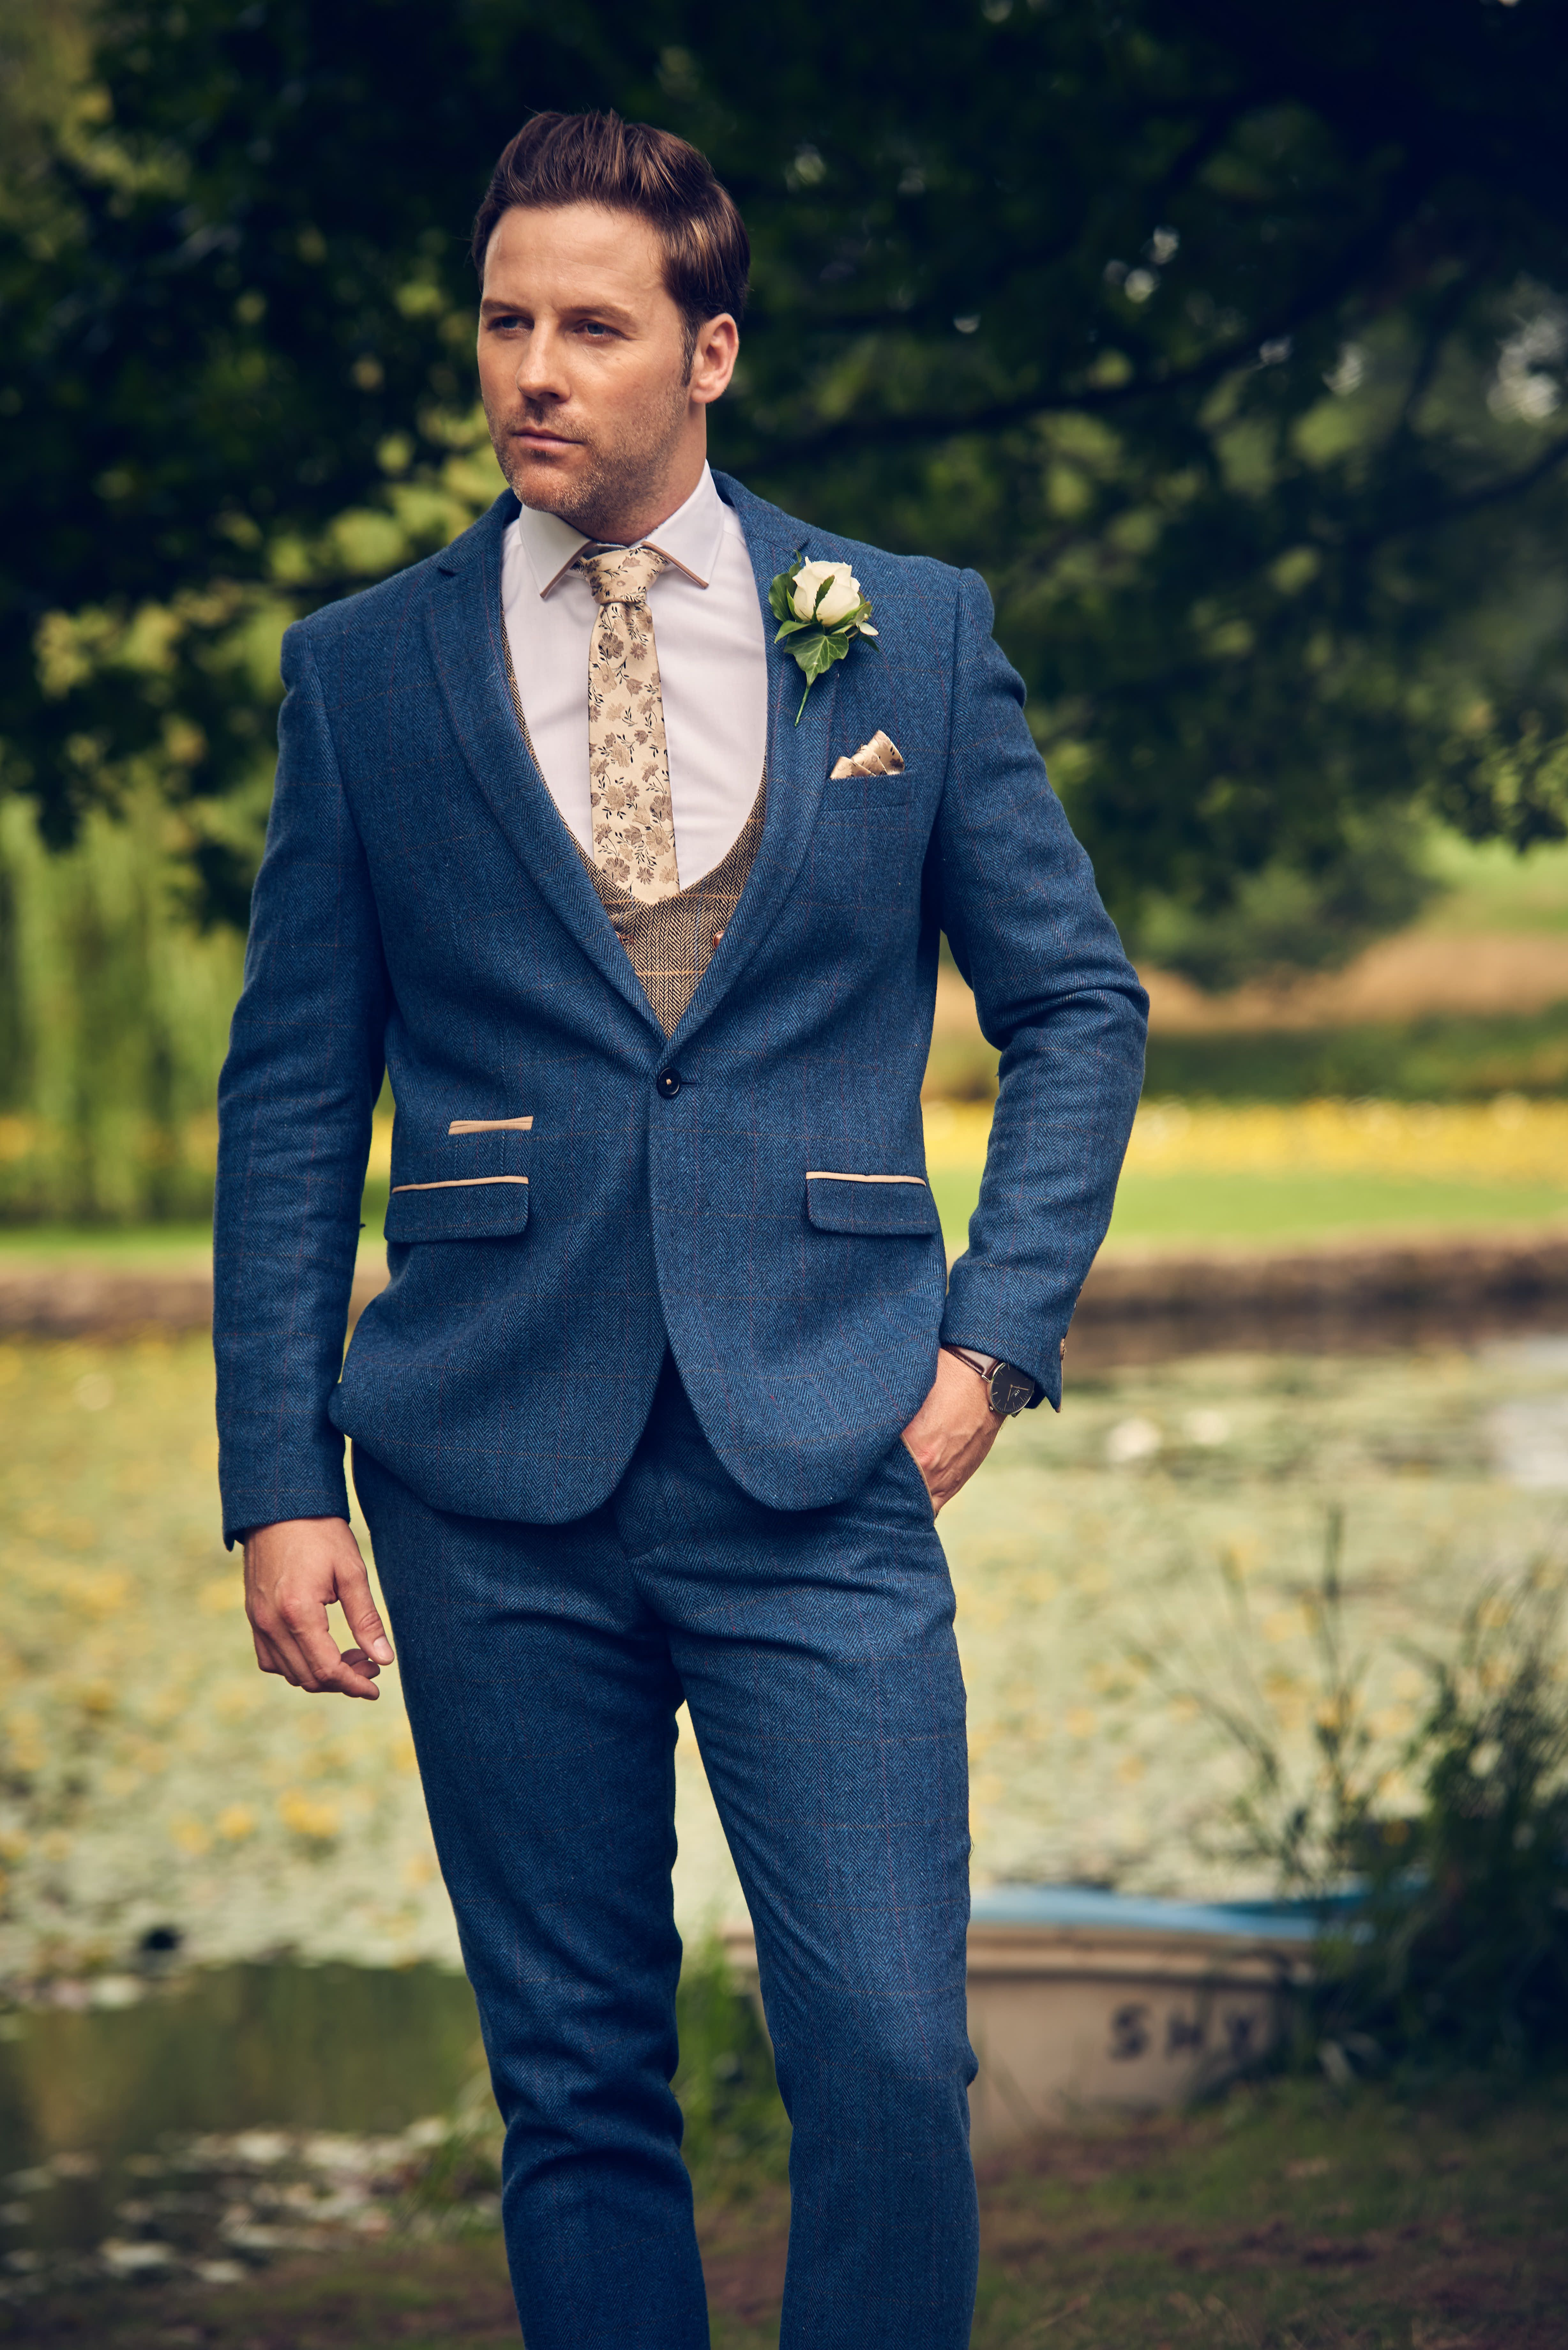 Marc Darcy Dion Tweed Herringbone Blue 3 Piece Suit in